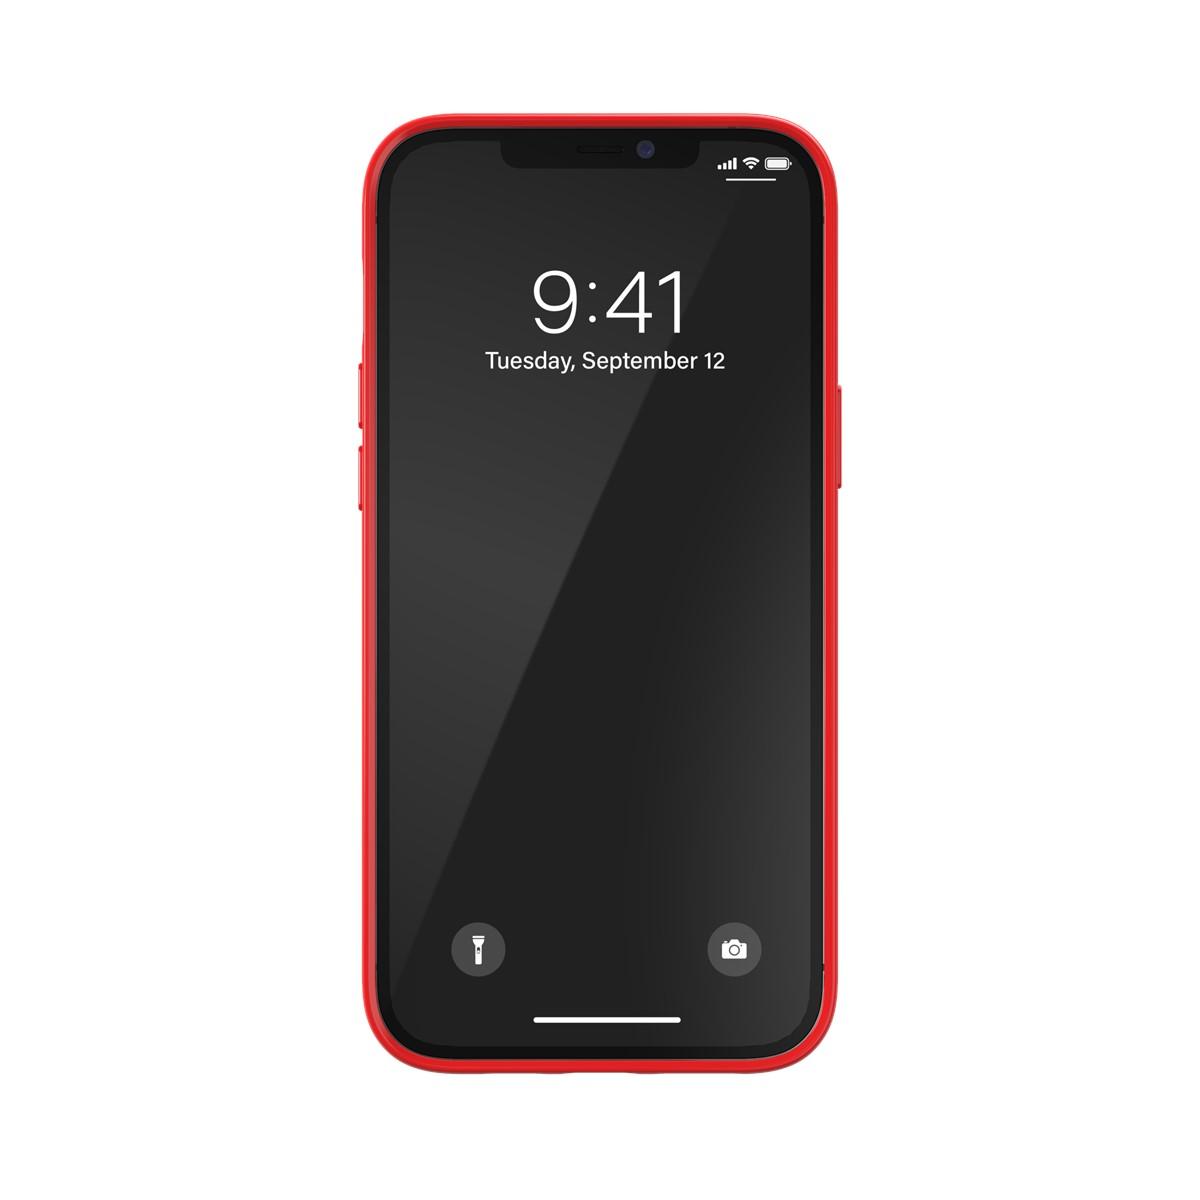 , Custodia Progettata Per Iphone 12 / Iphone 12 Pro 6.1, Custodia Testata